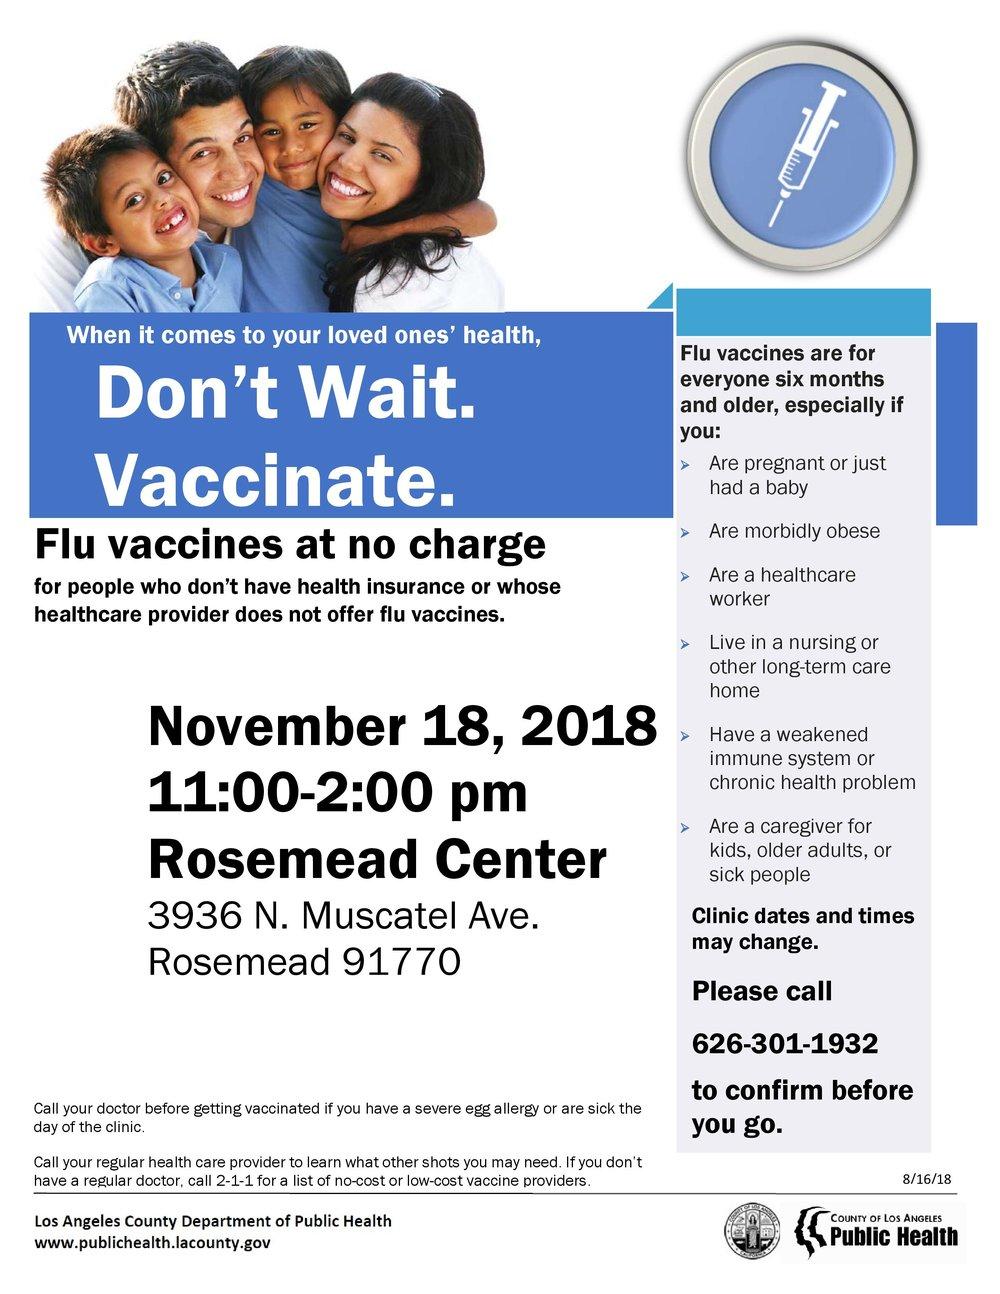 Flu vaccines - November 18th, 2018